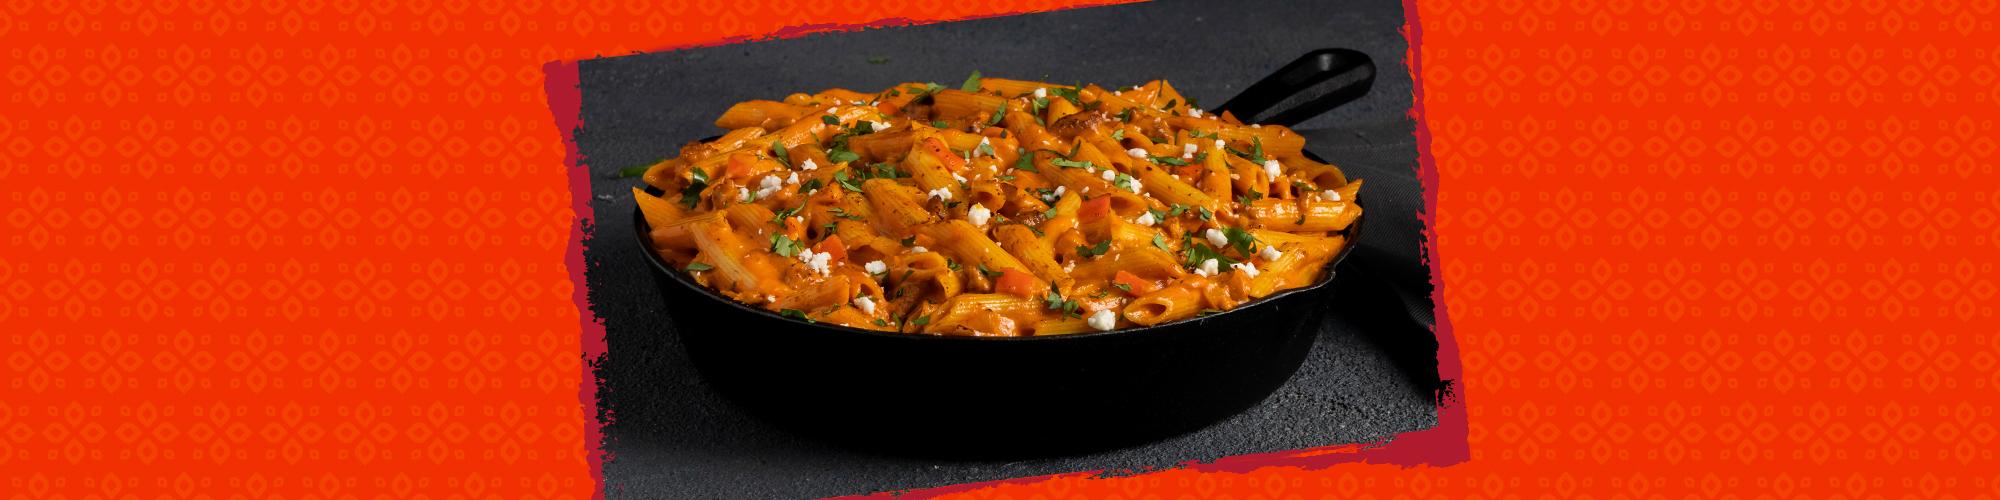 Salsas chipotle chorizo pasta